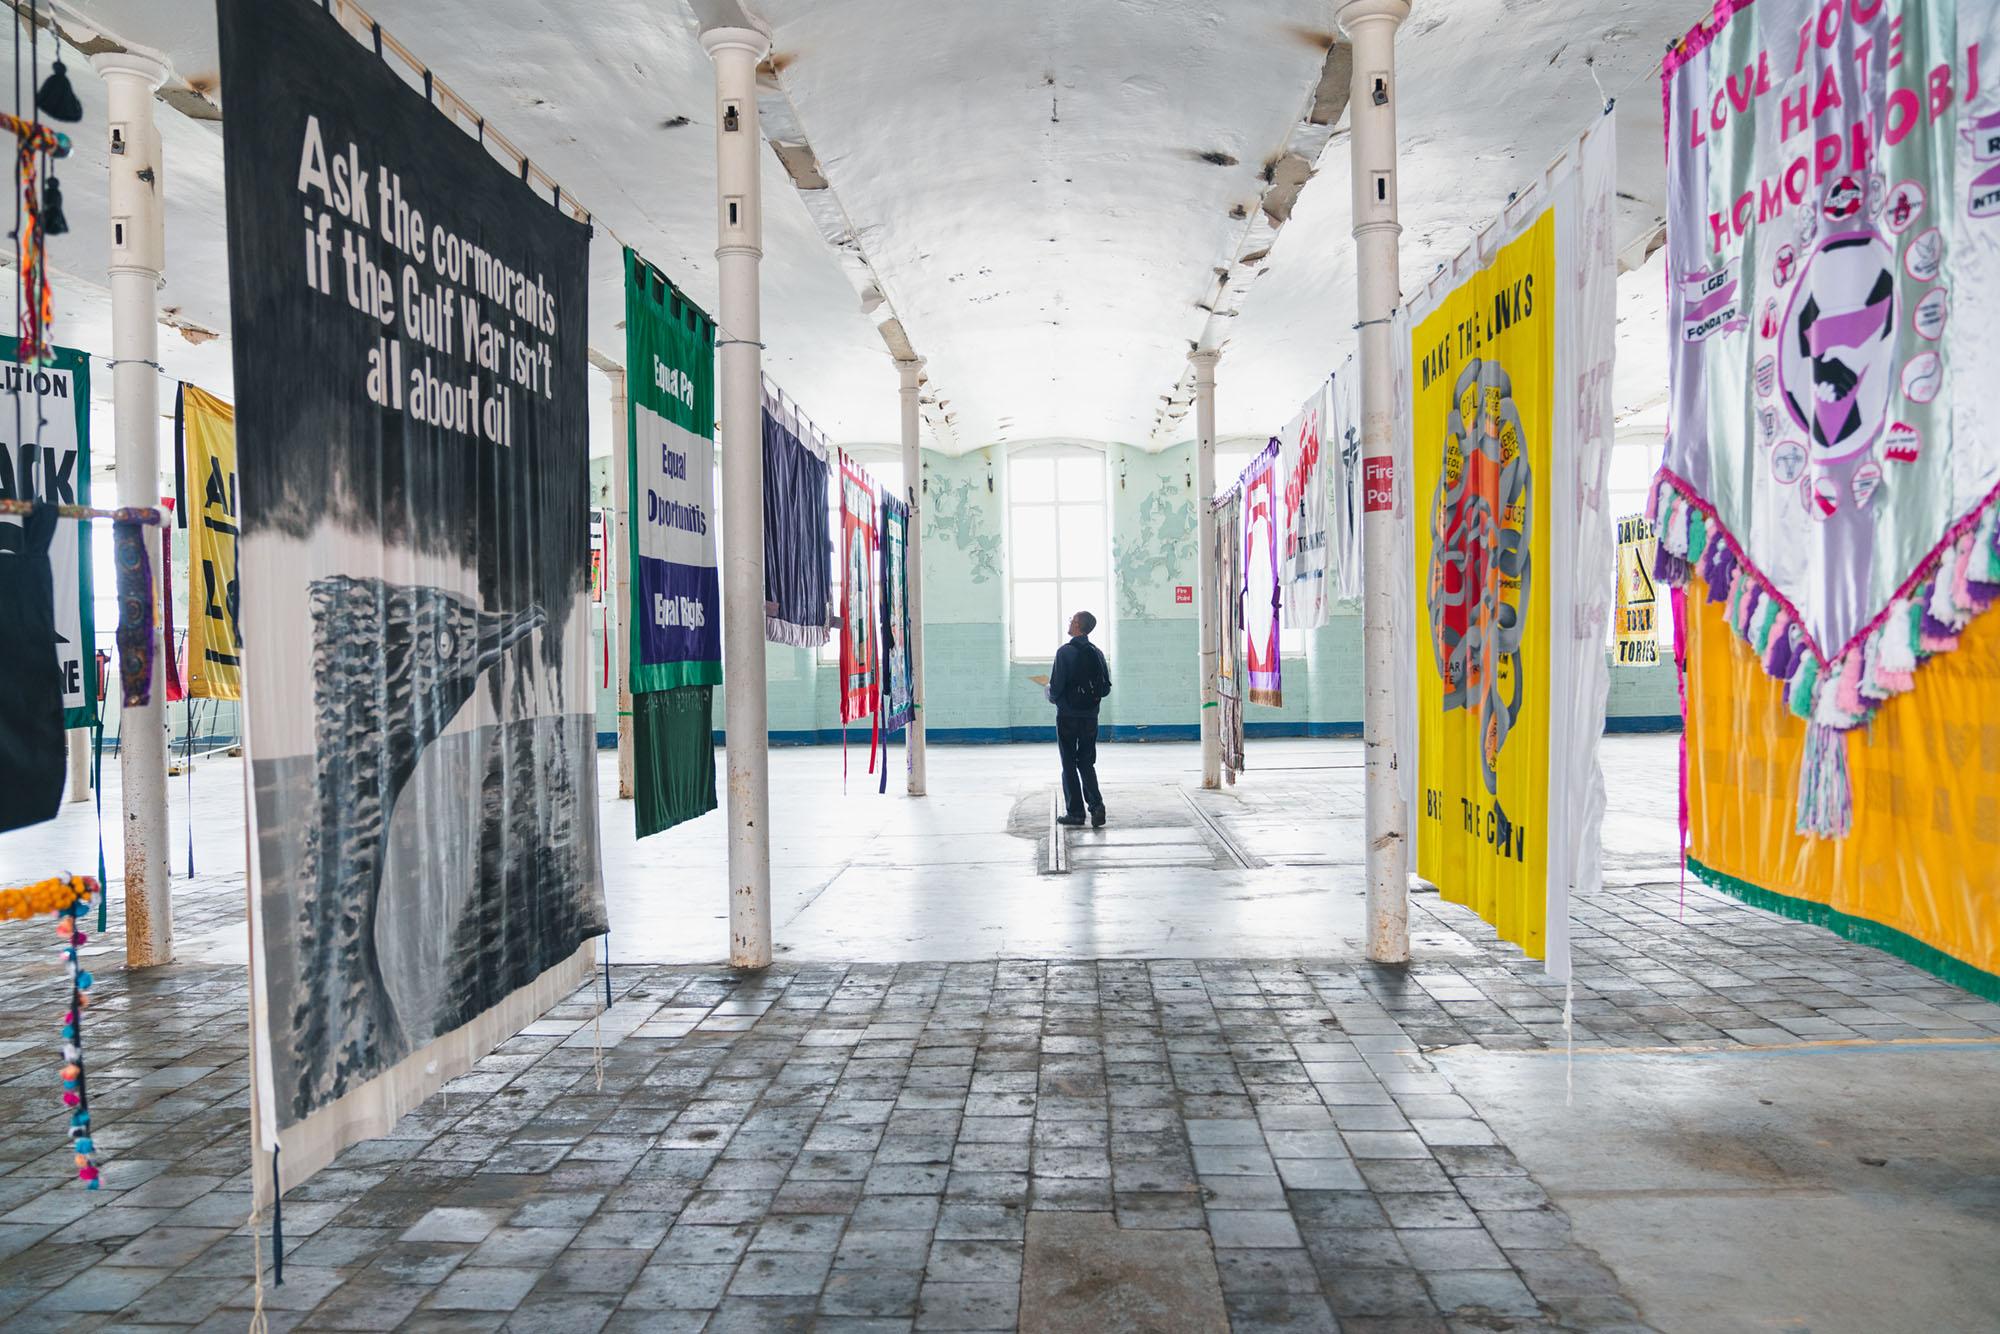 Banner-Culture-Brierfield-Mill-British-Textile-Biennial-06-10-19-Richard-Tymon-31-LR